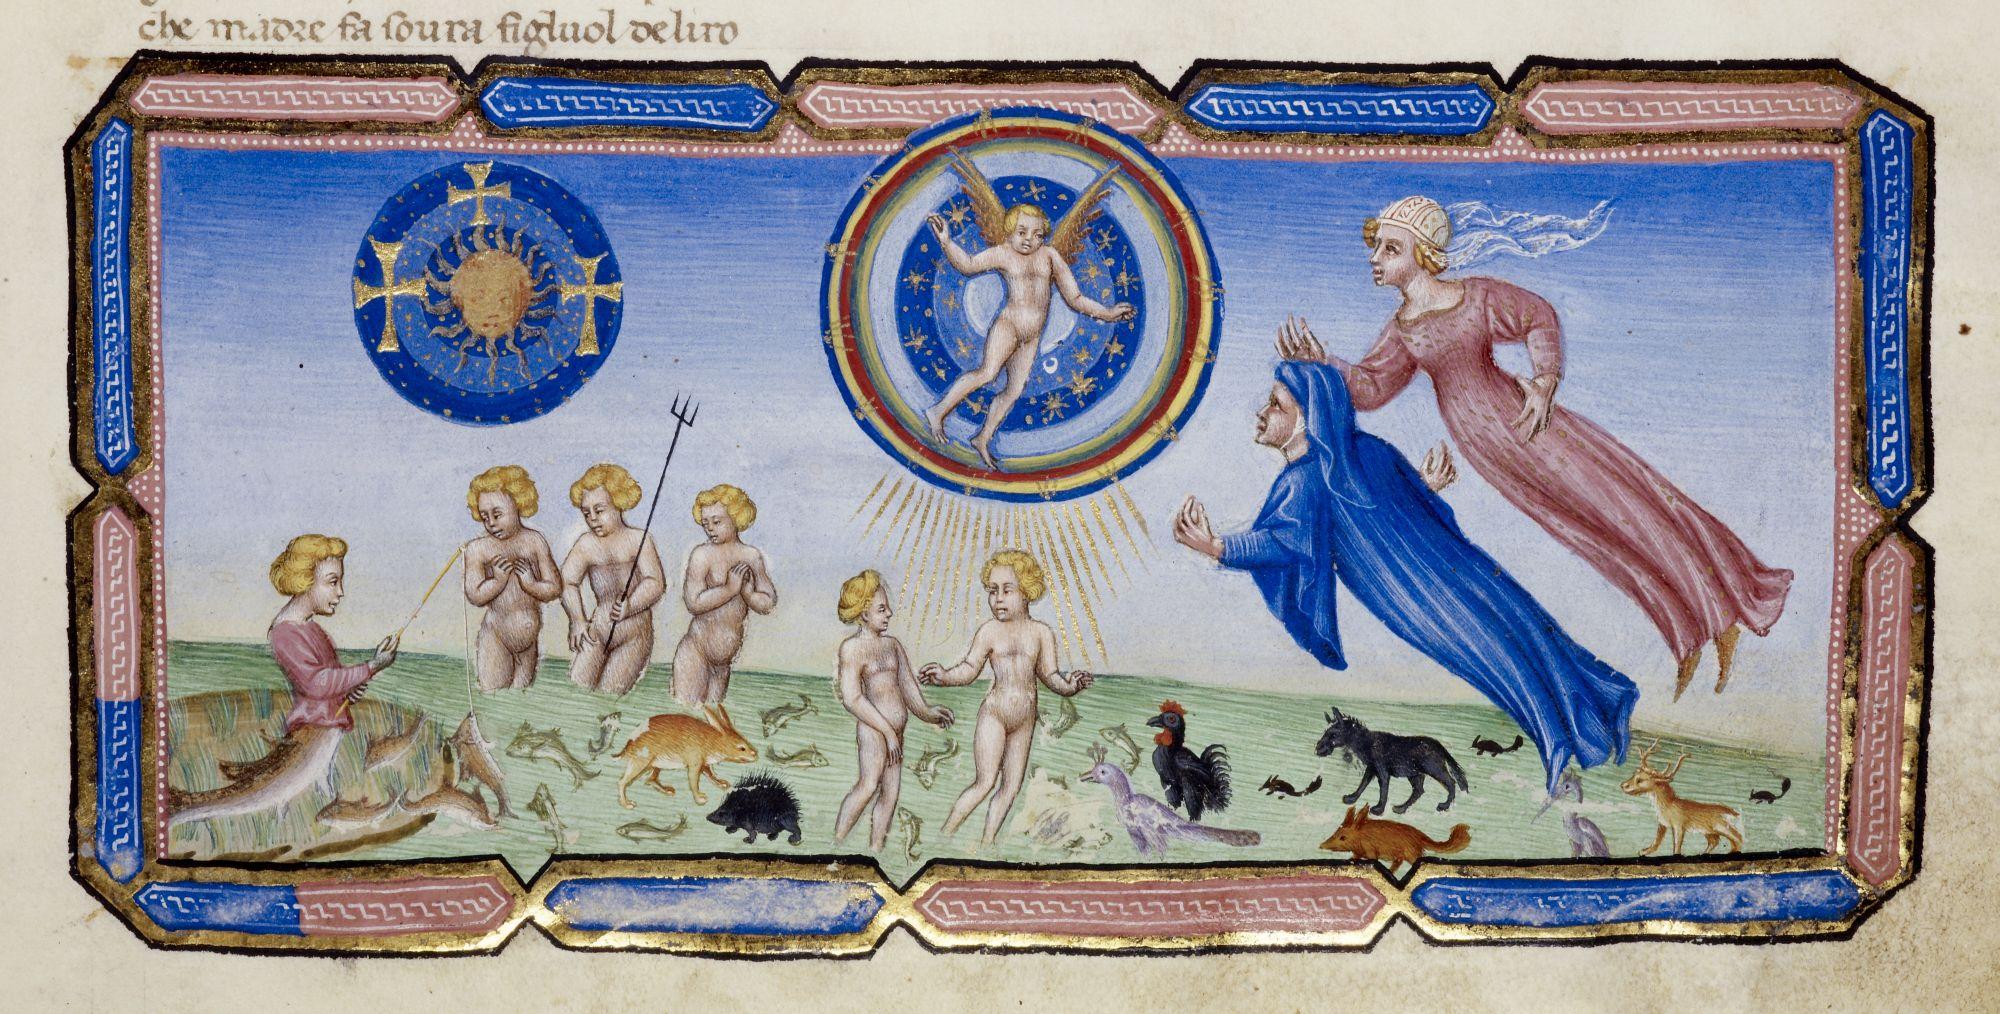 Illustration from Dante's Divine Comedy by Giovanni de Paolo; scene shows Dante ascending to heaven with Beatrice